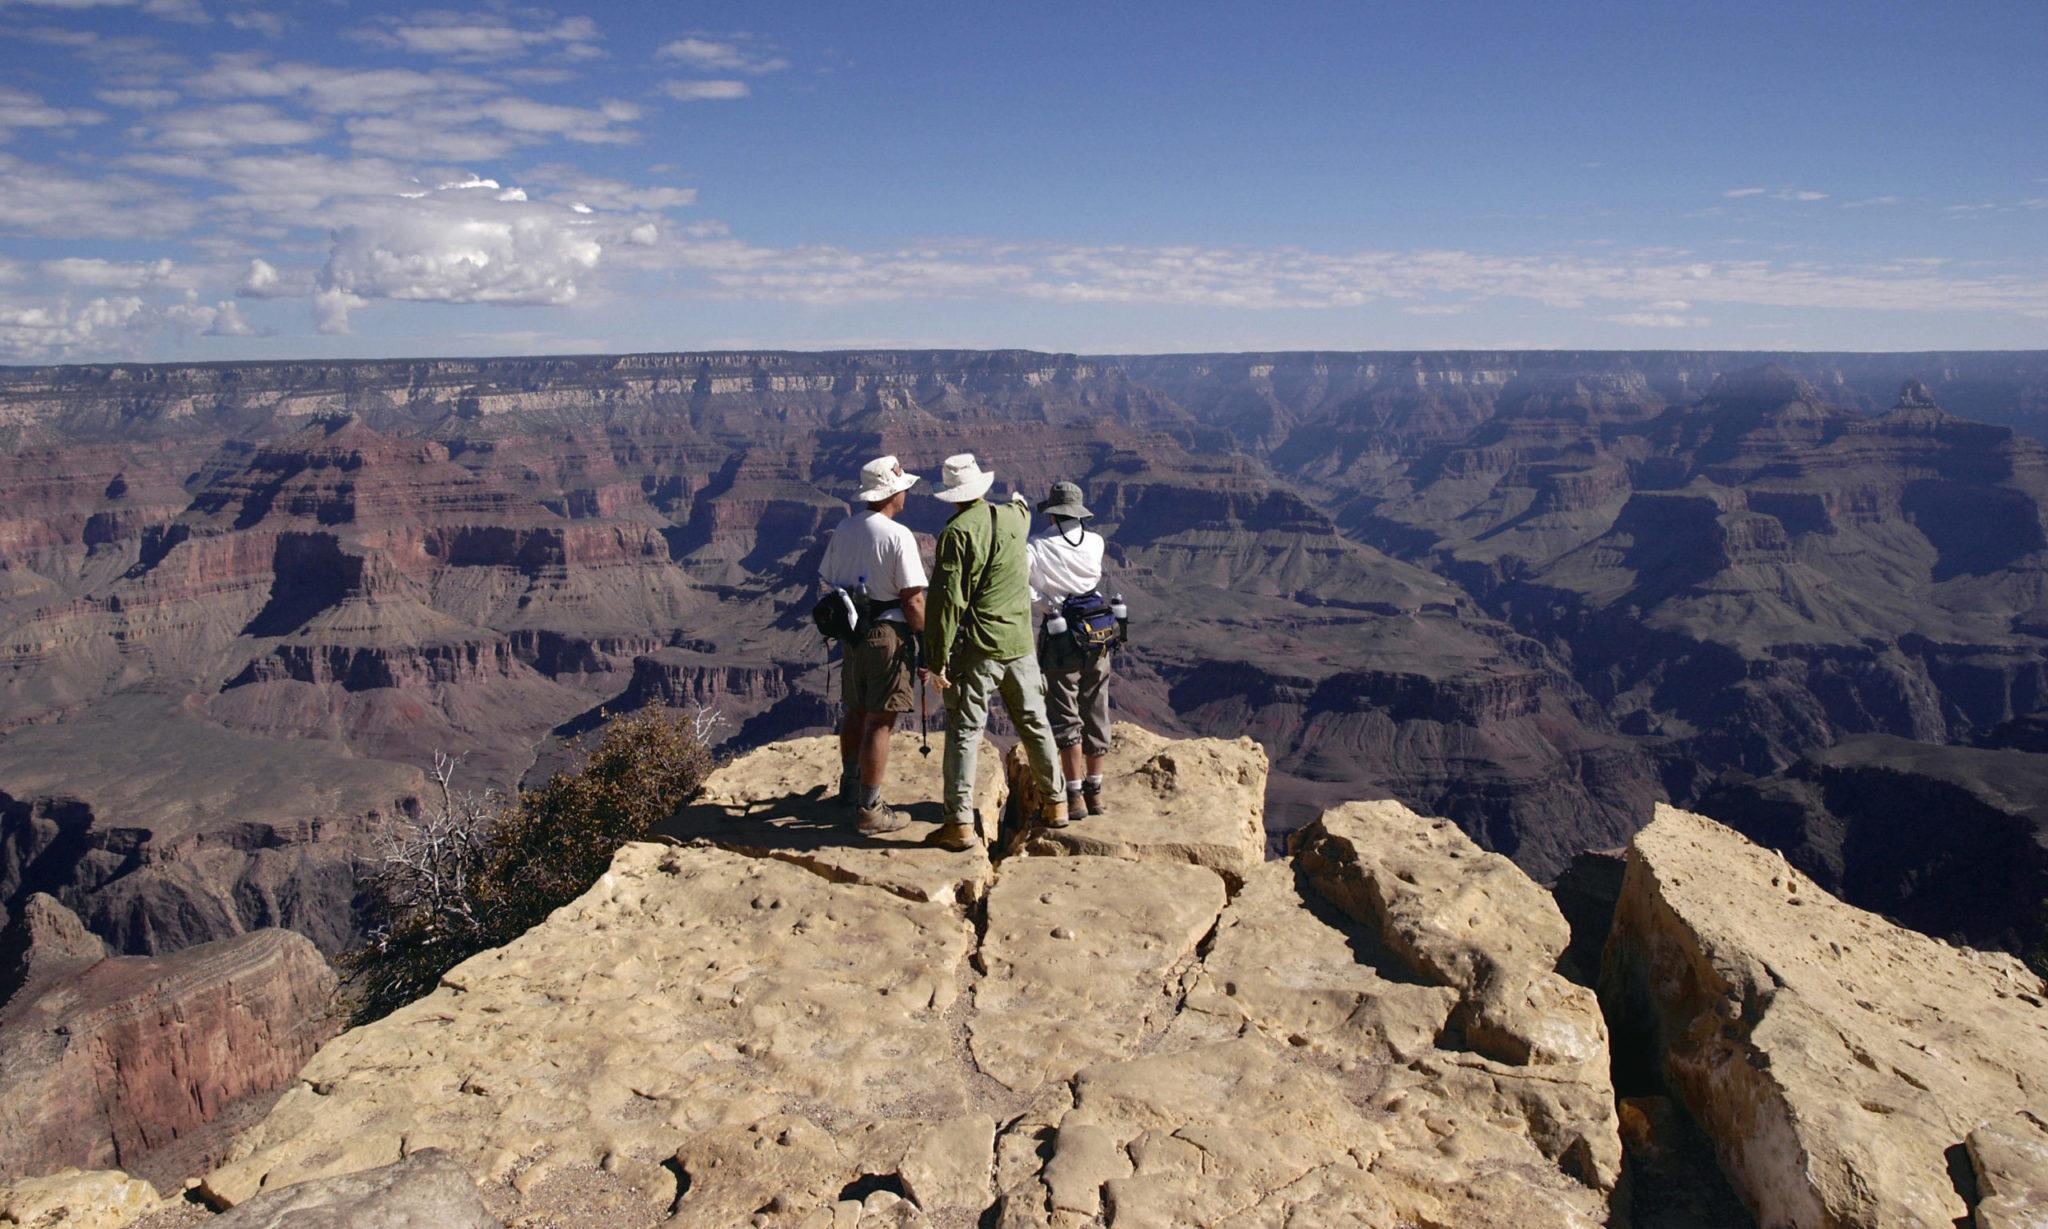 11 Day West US Tour: Grand Canyon, Yosemite & Las Vegas Camping trip